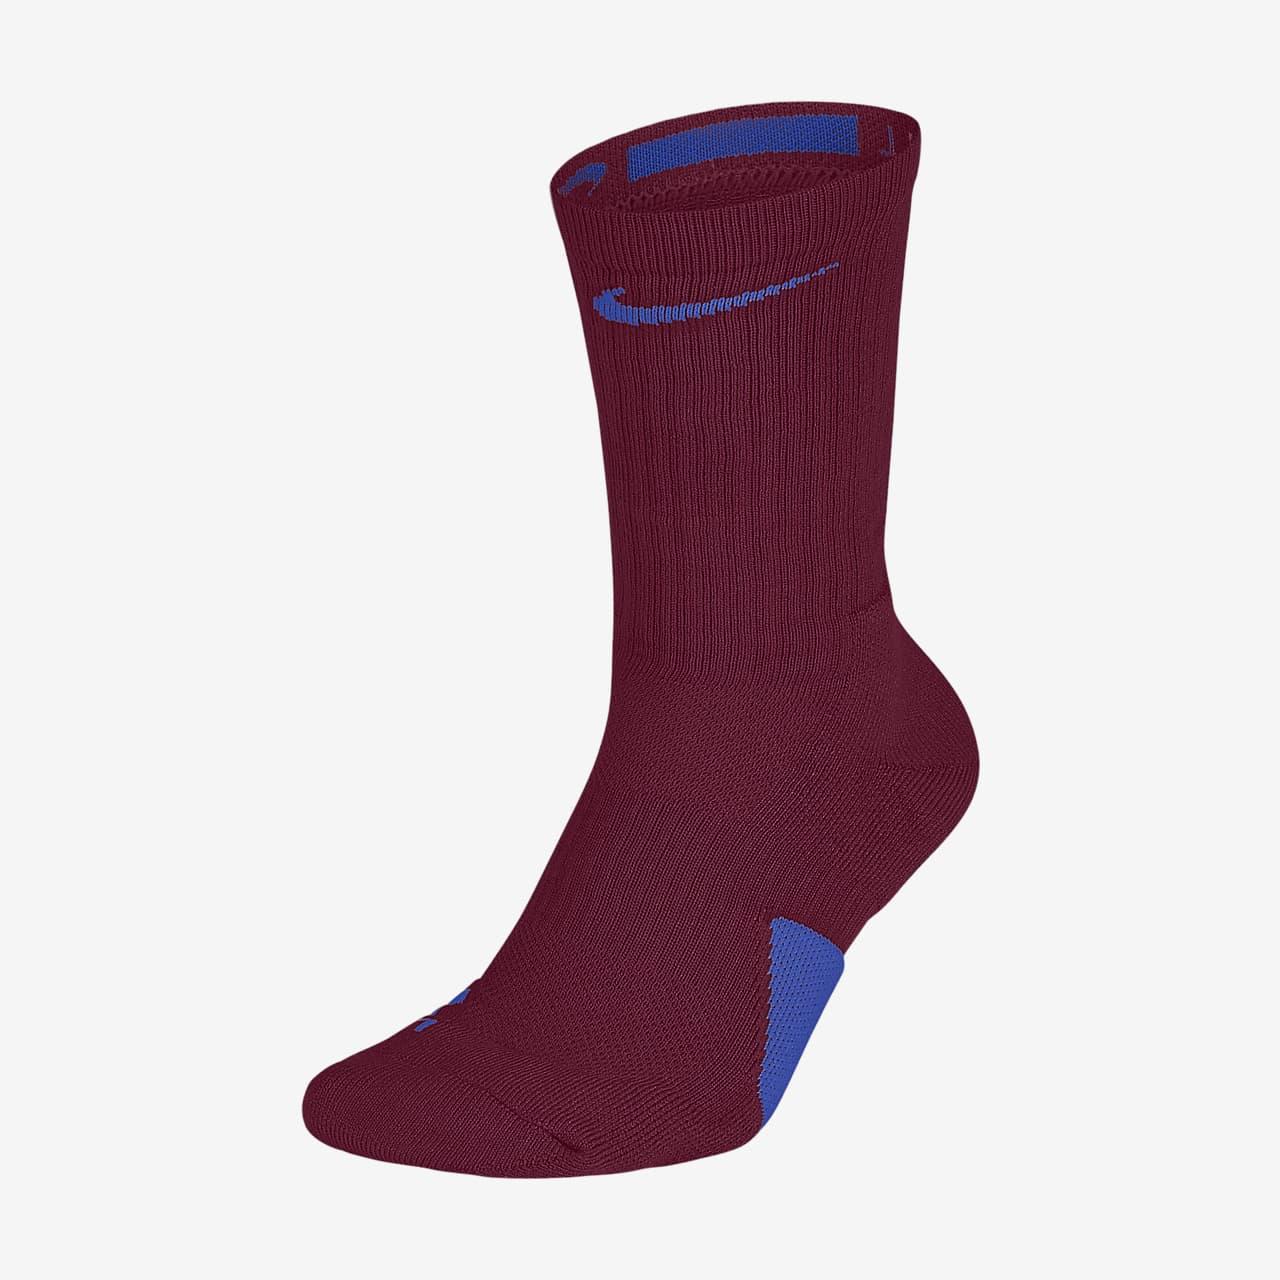 Nike Elite Crew Basketball Socks SX7622-638